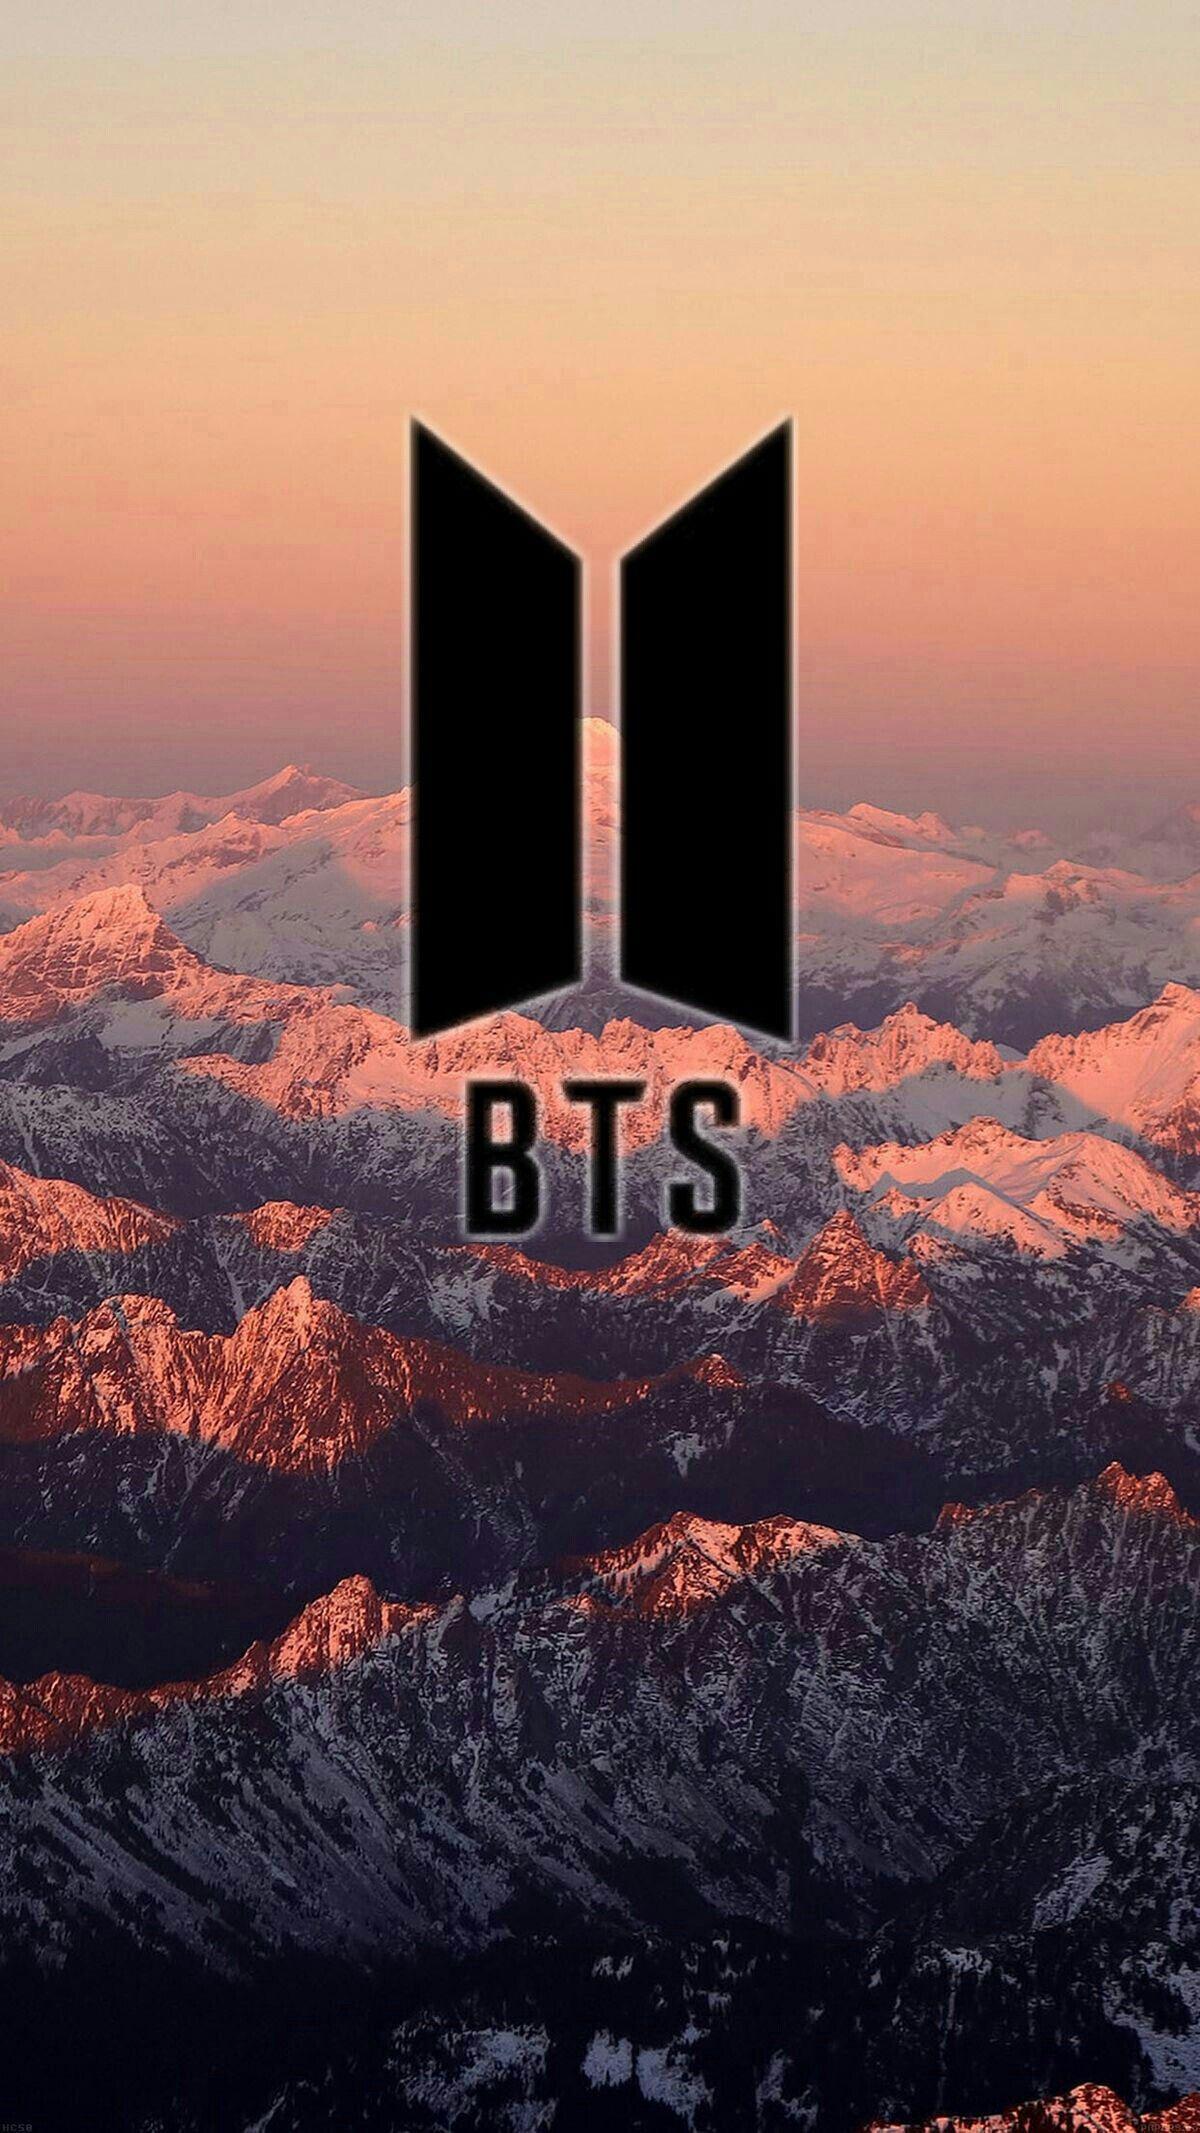 Wallpaper Iphone Bts Logo